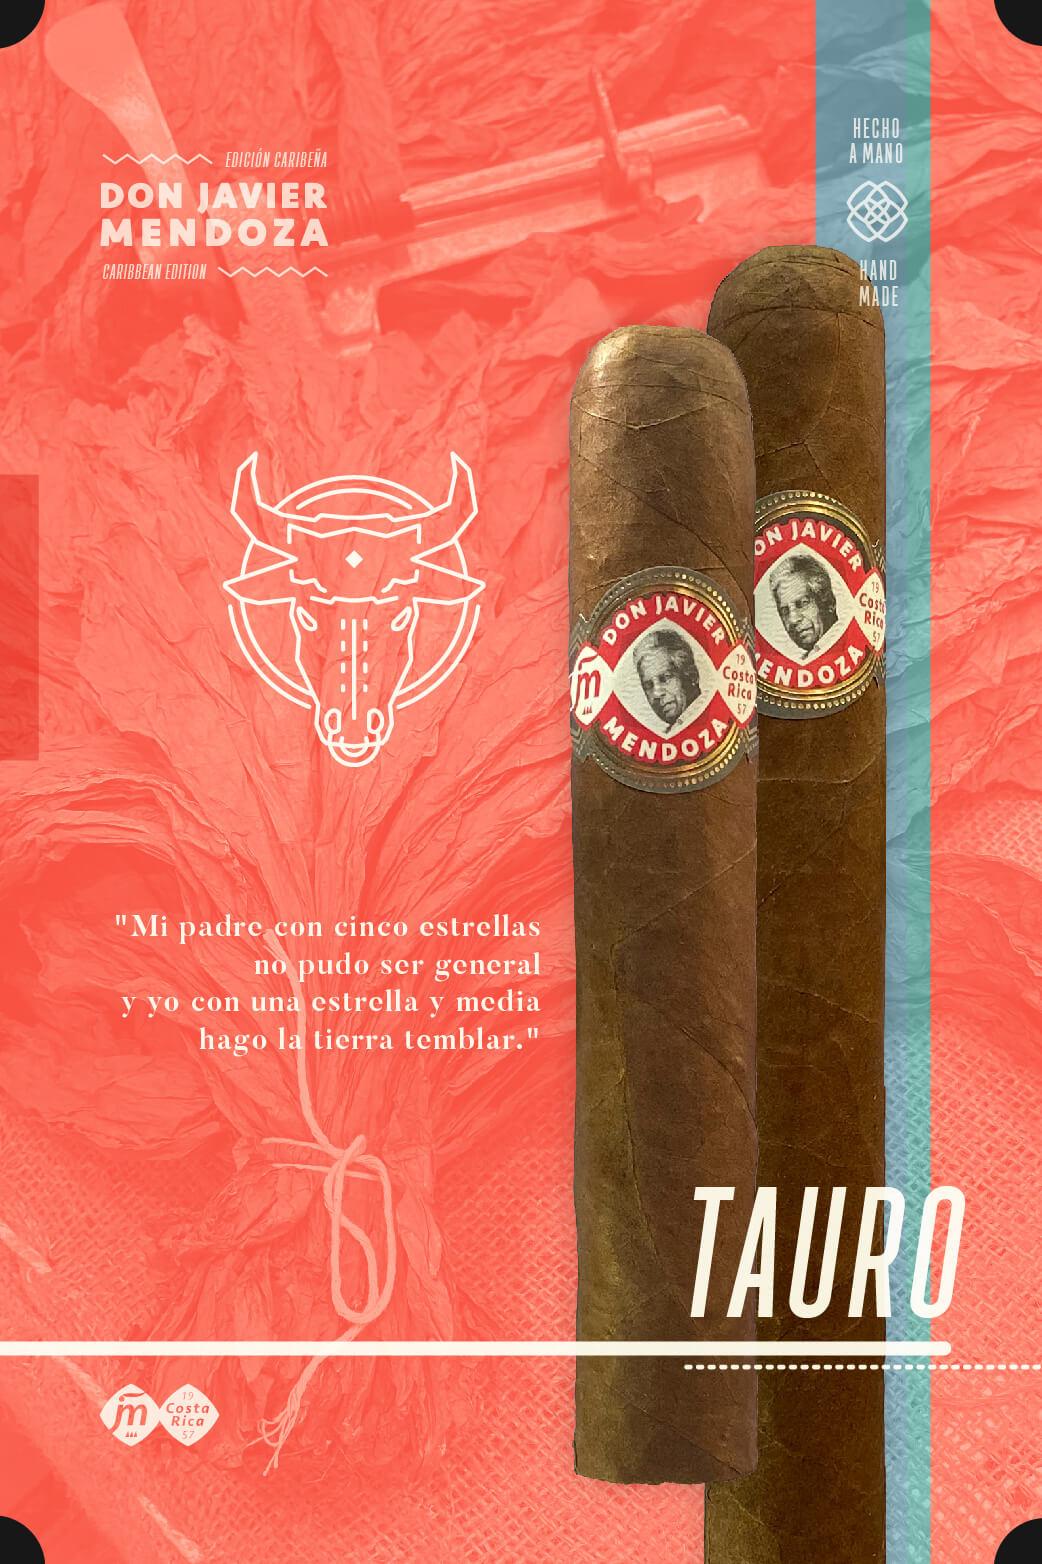 Don Javier Mendoza Tauro